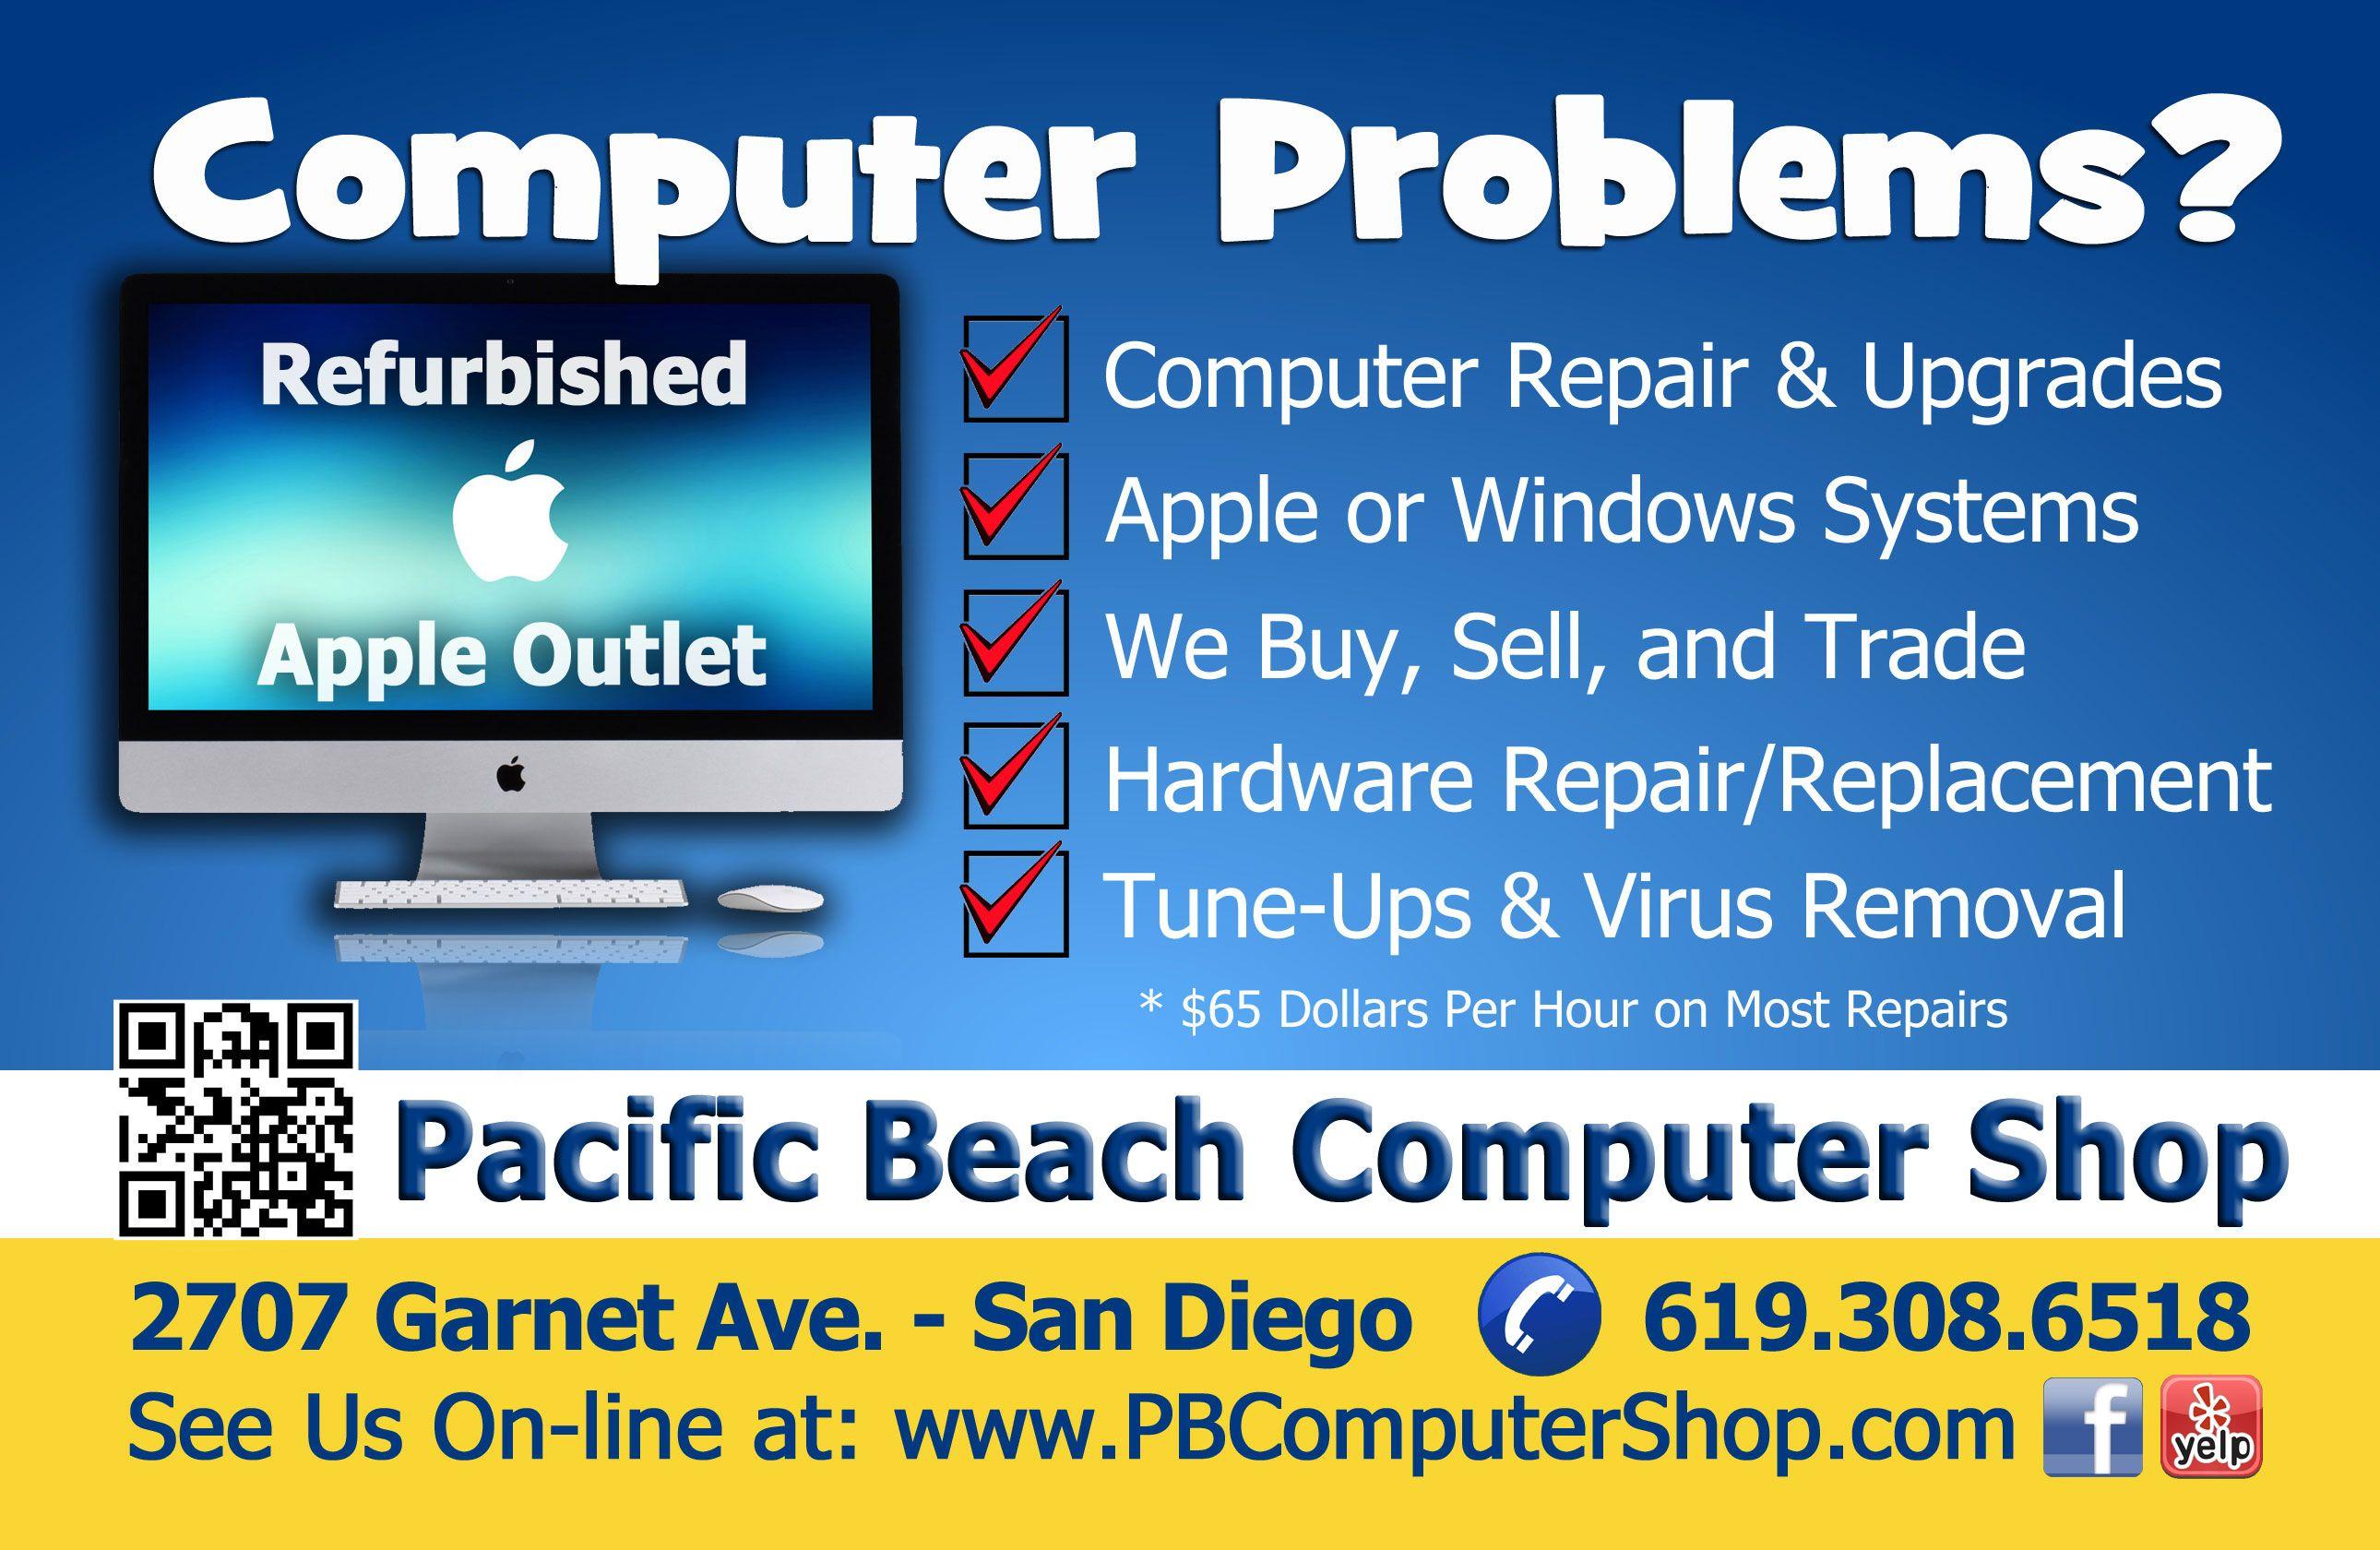 PB Computer Shop Flyer Computer Repair San Diego CA